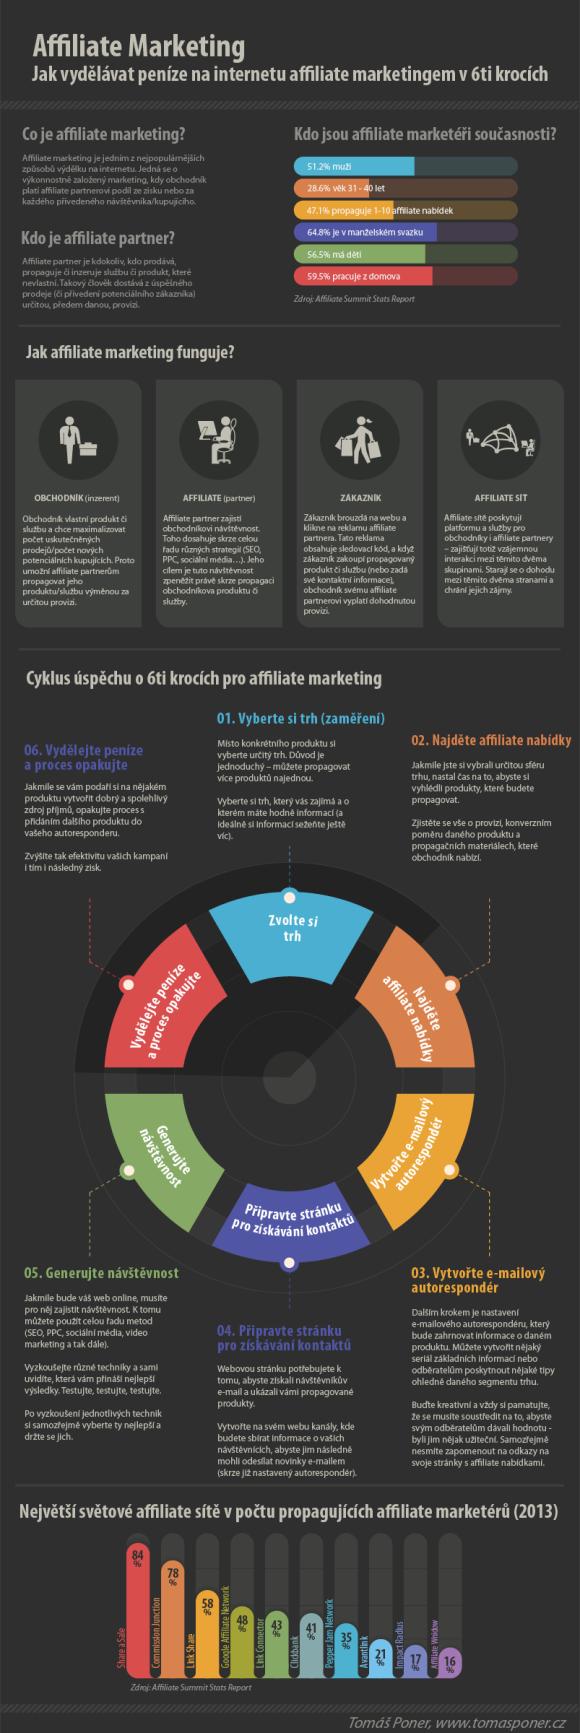 Affiliate marketing Jak vydelavat penize na internetu affiliate marketingem v 6ti krocich1 580x1733 Infografika: Jak vydělávat peníze na internetu affiliate marketingem v 6ti krocích